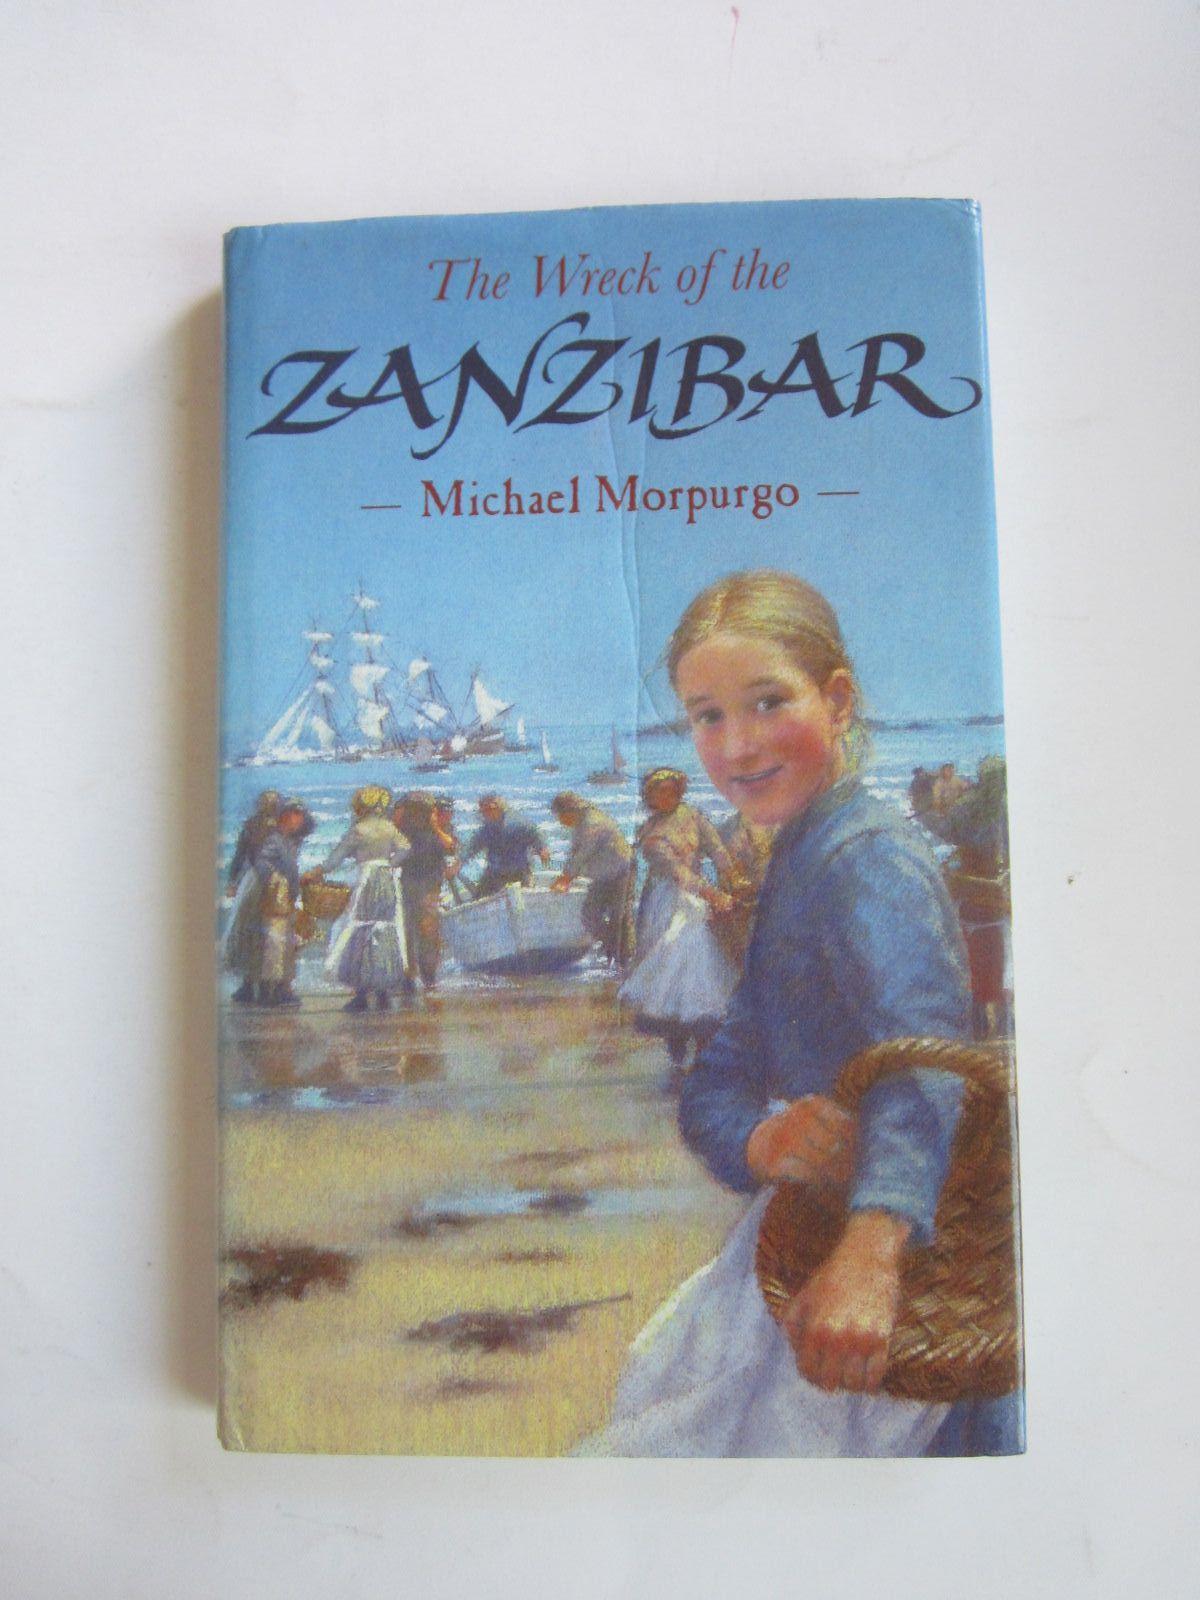 The wreck of the zanzibar book report